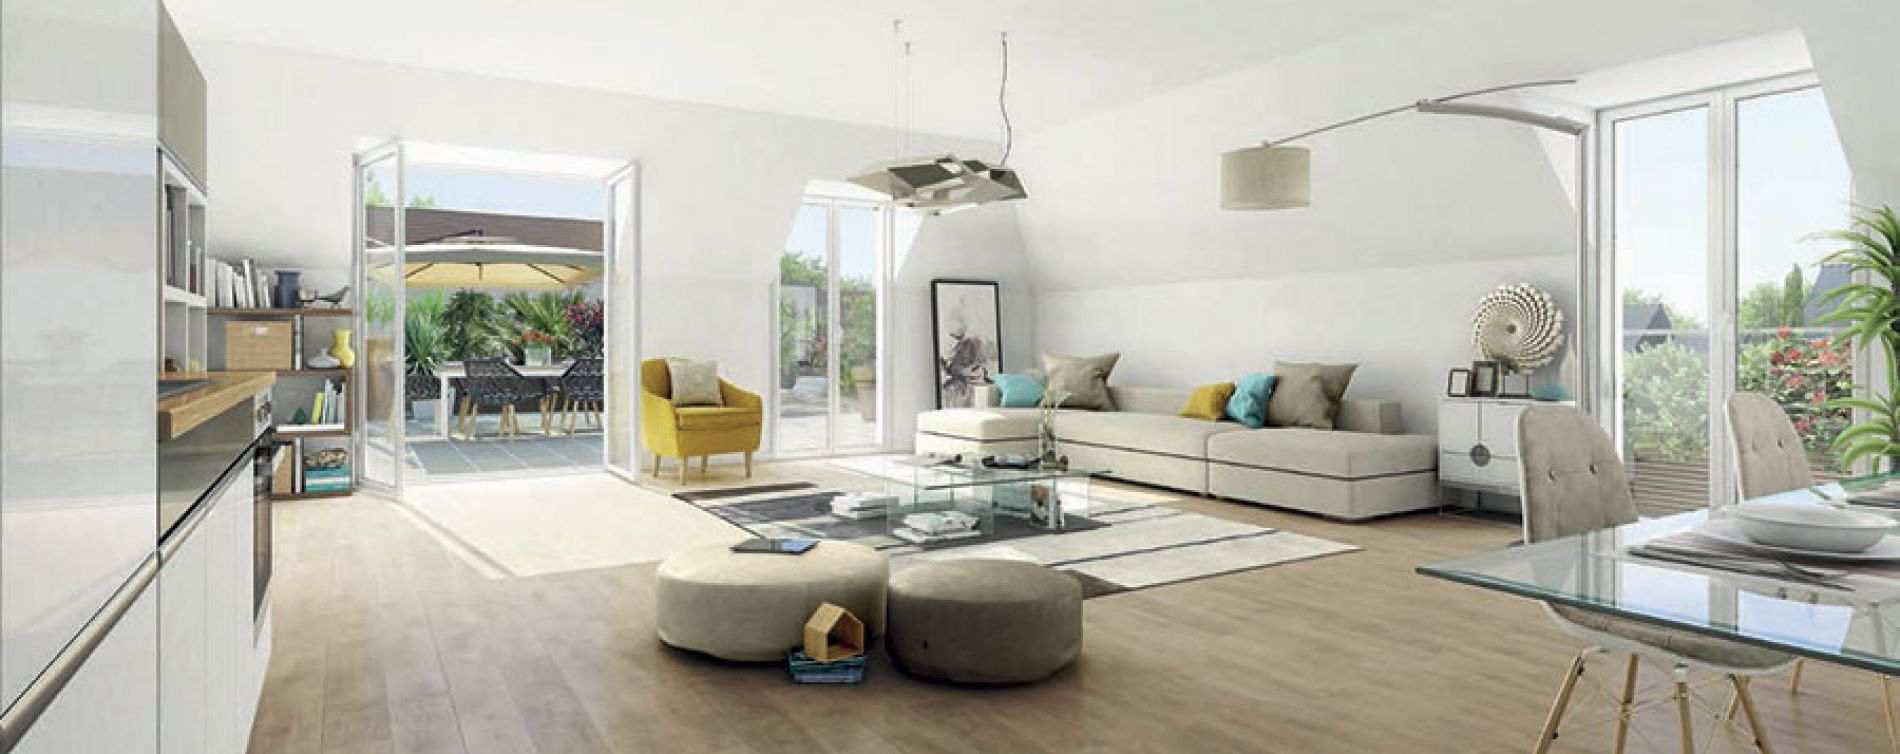 Domont : programme immobilier neuve « Programme immobilier n°212738 » (3)